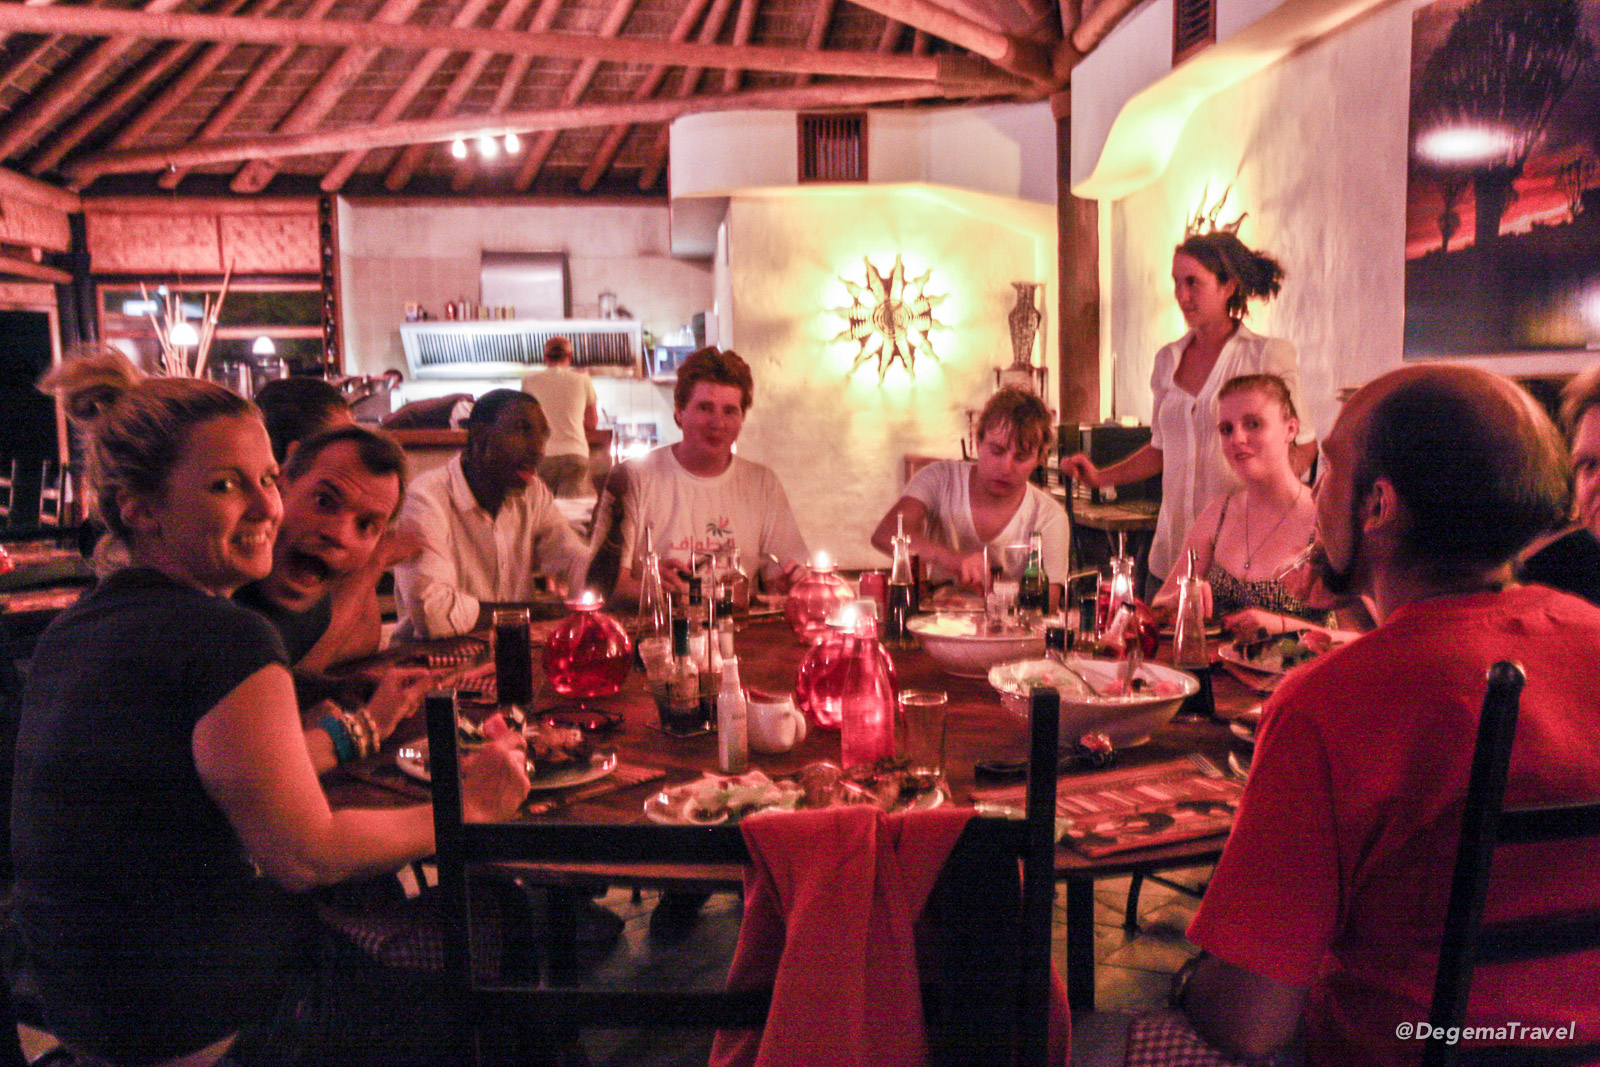 Dinner at the restaurant at Felix Unite, Namibia